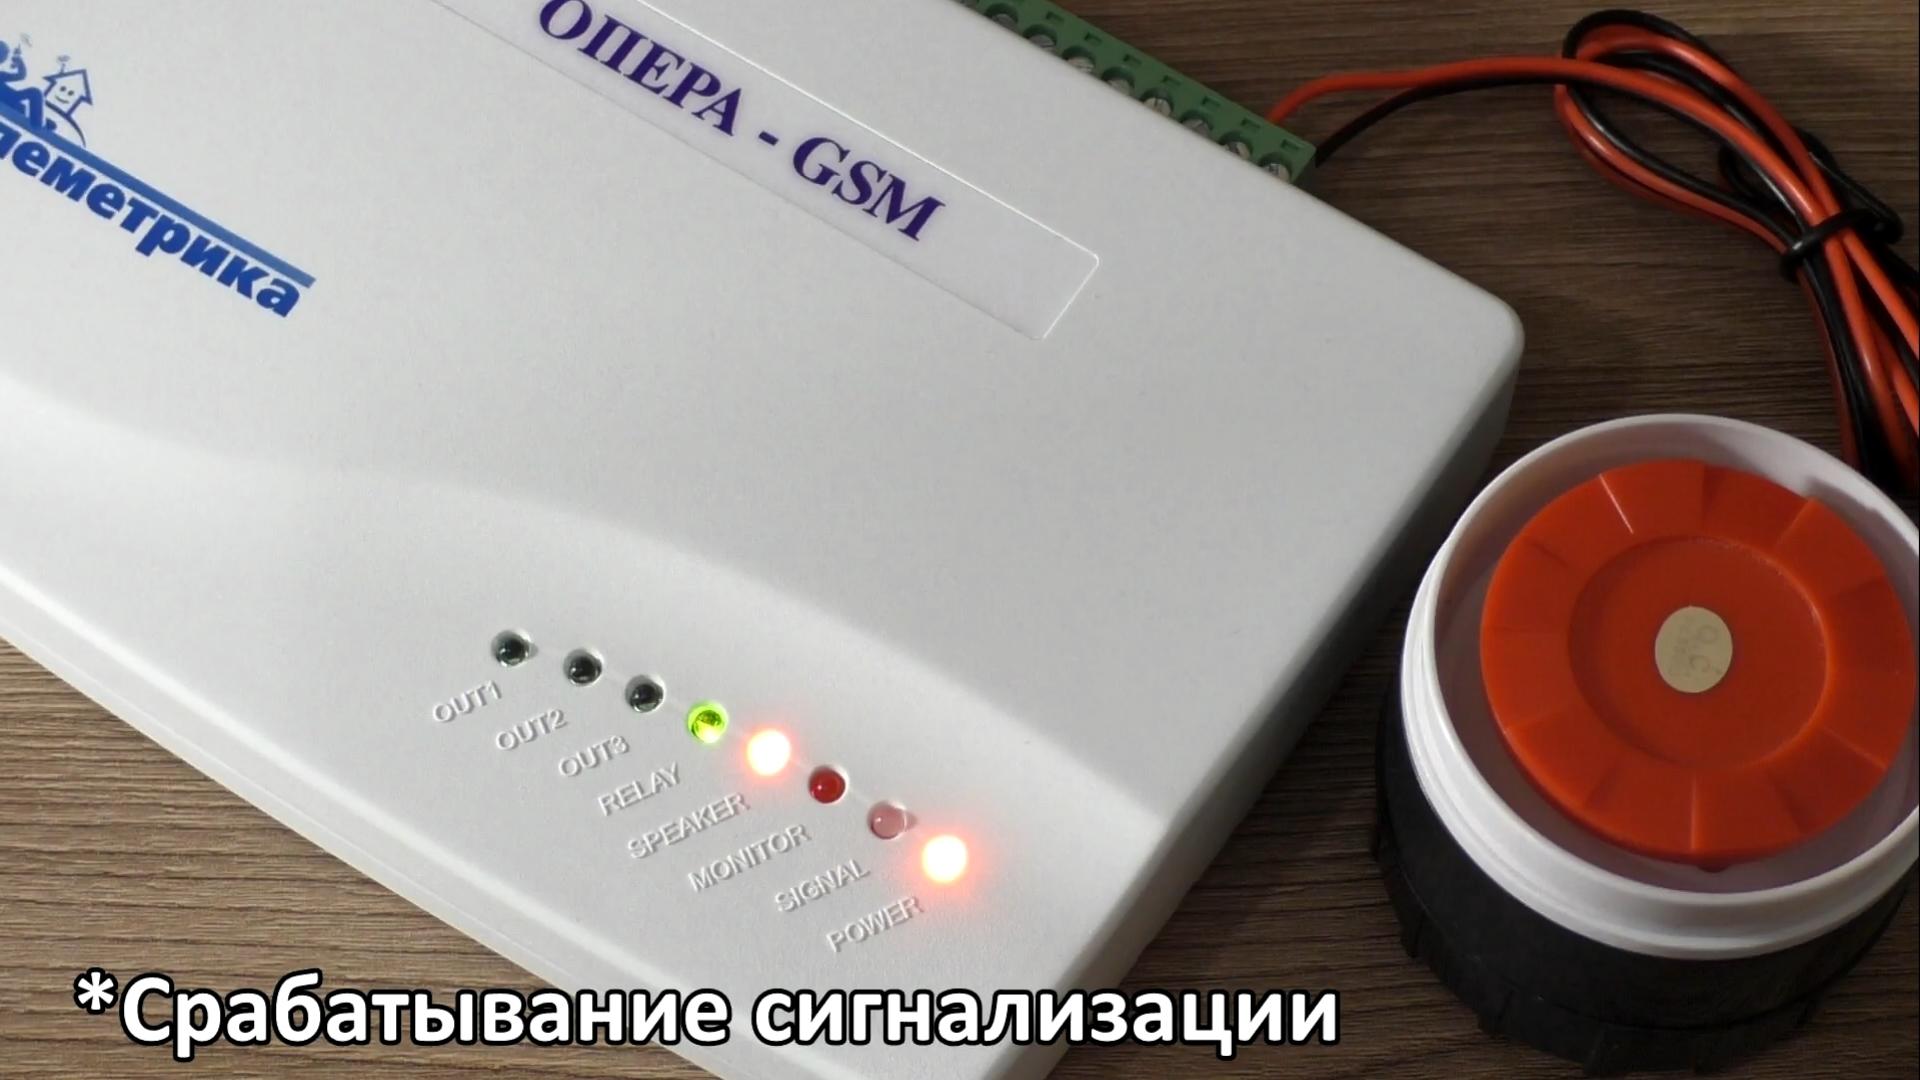 Срабатывание GSM сигнализации